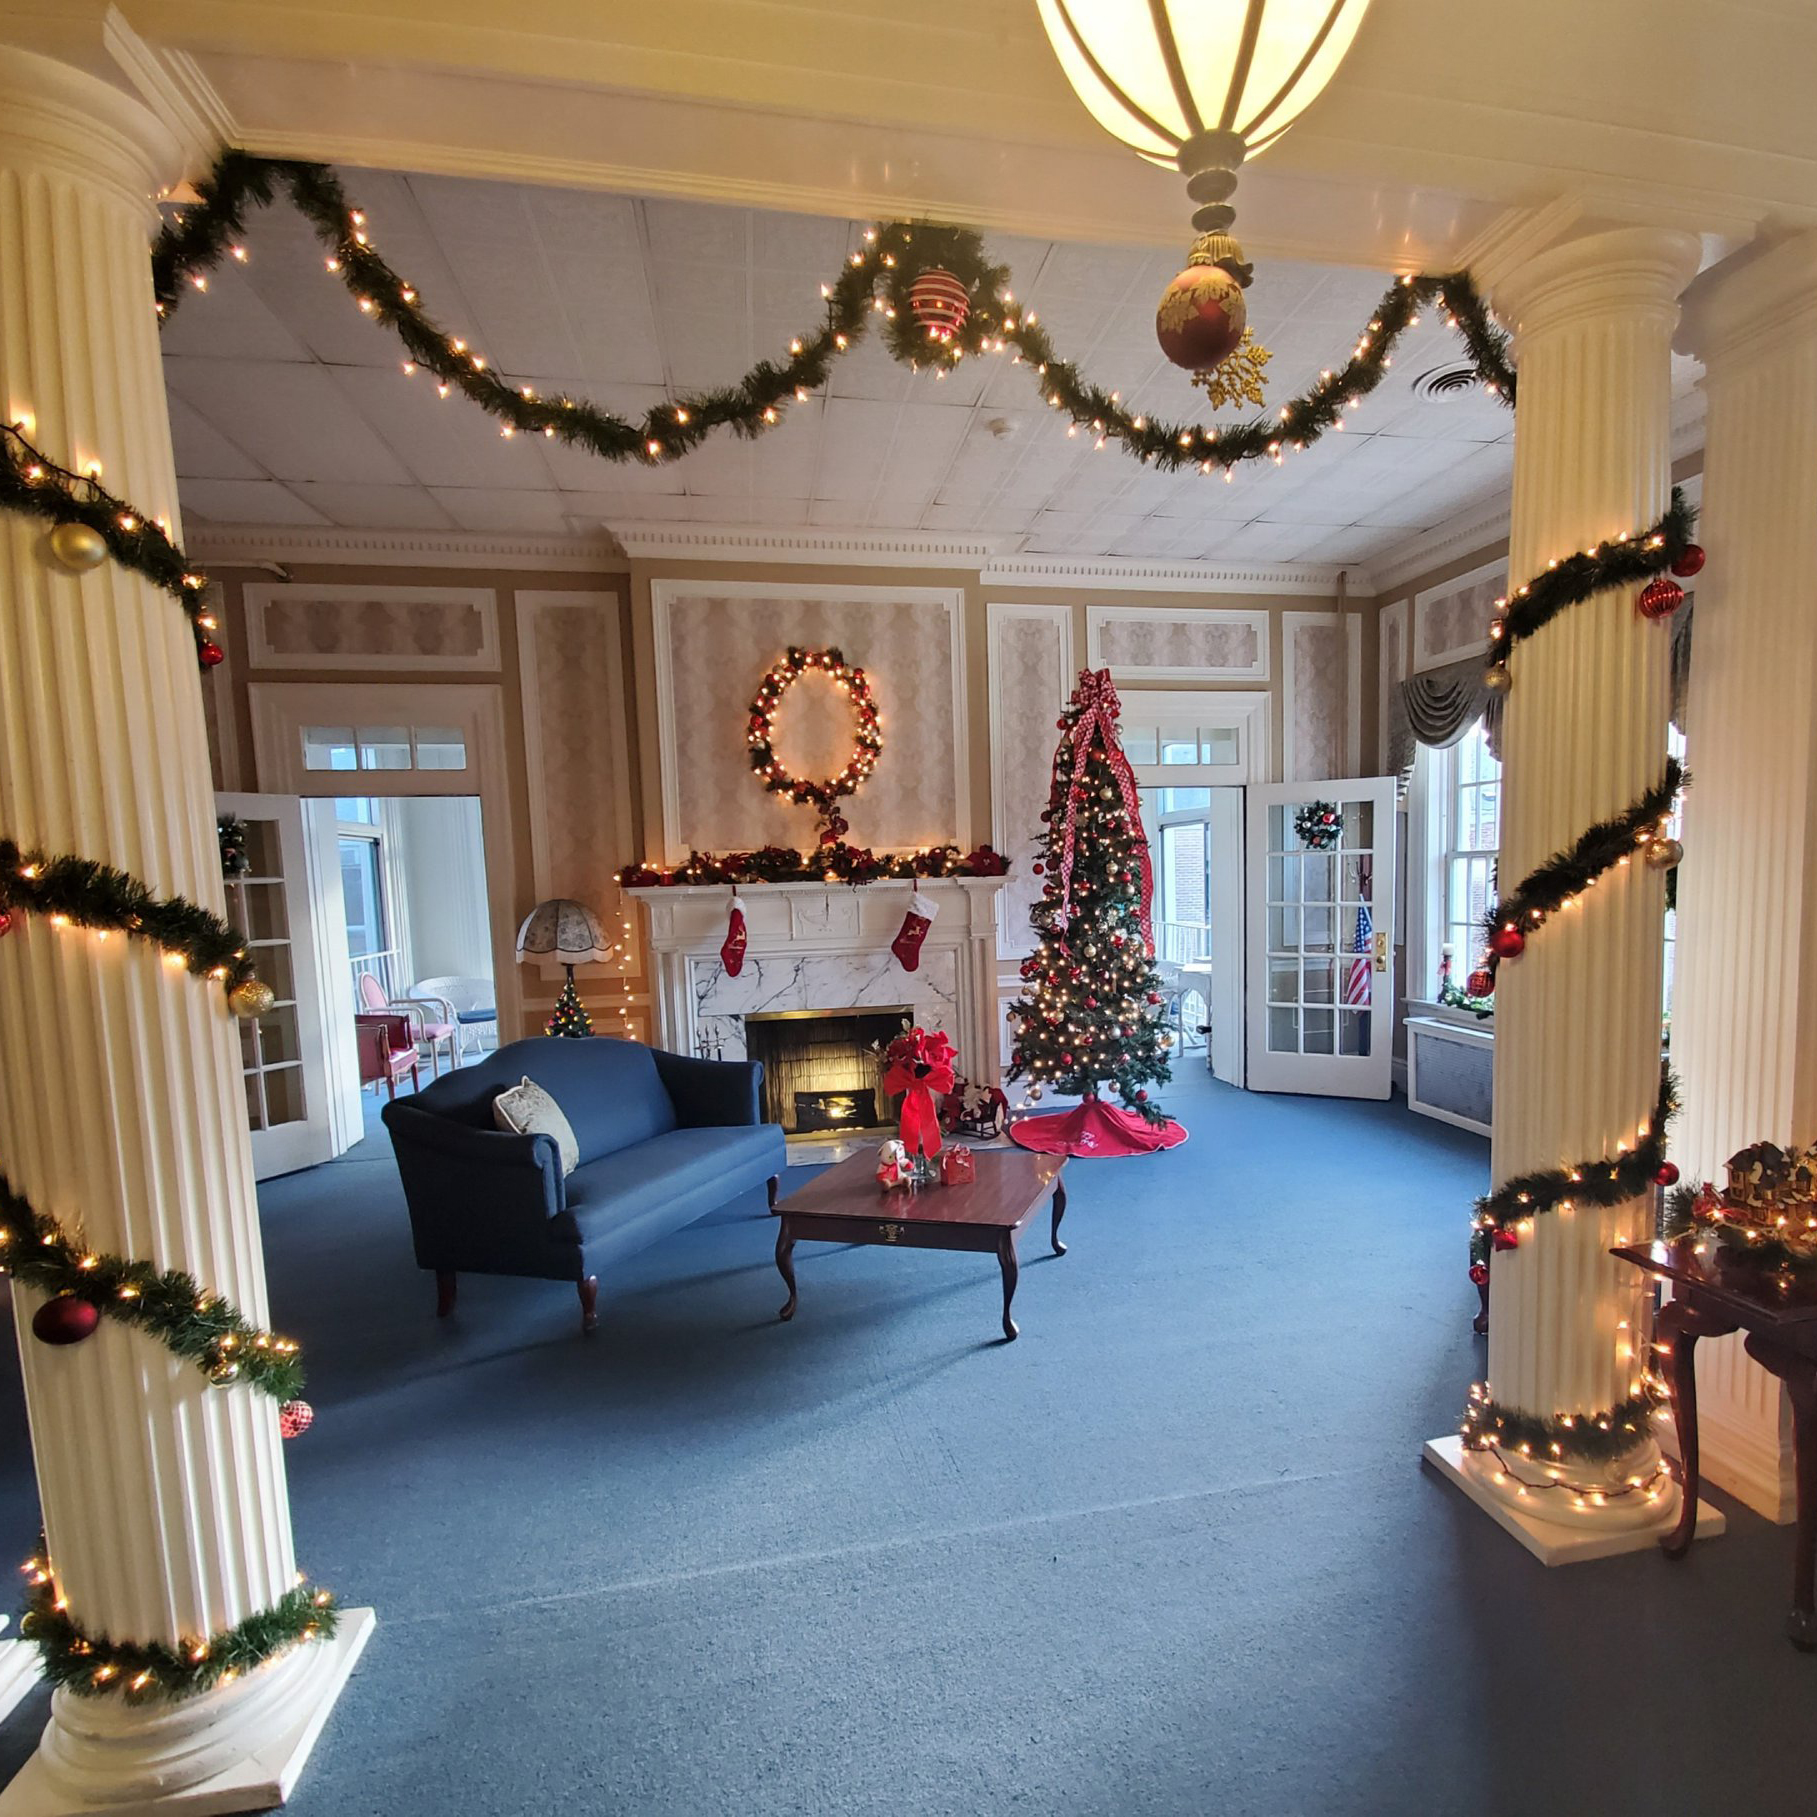 Lounge decorated for the holidays at Kadima at Lititz Nursing and Rehabilitation Facility